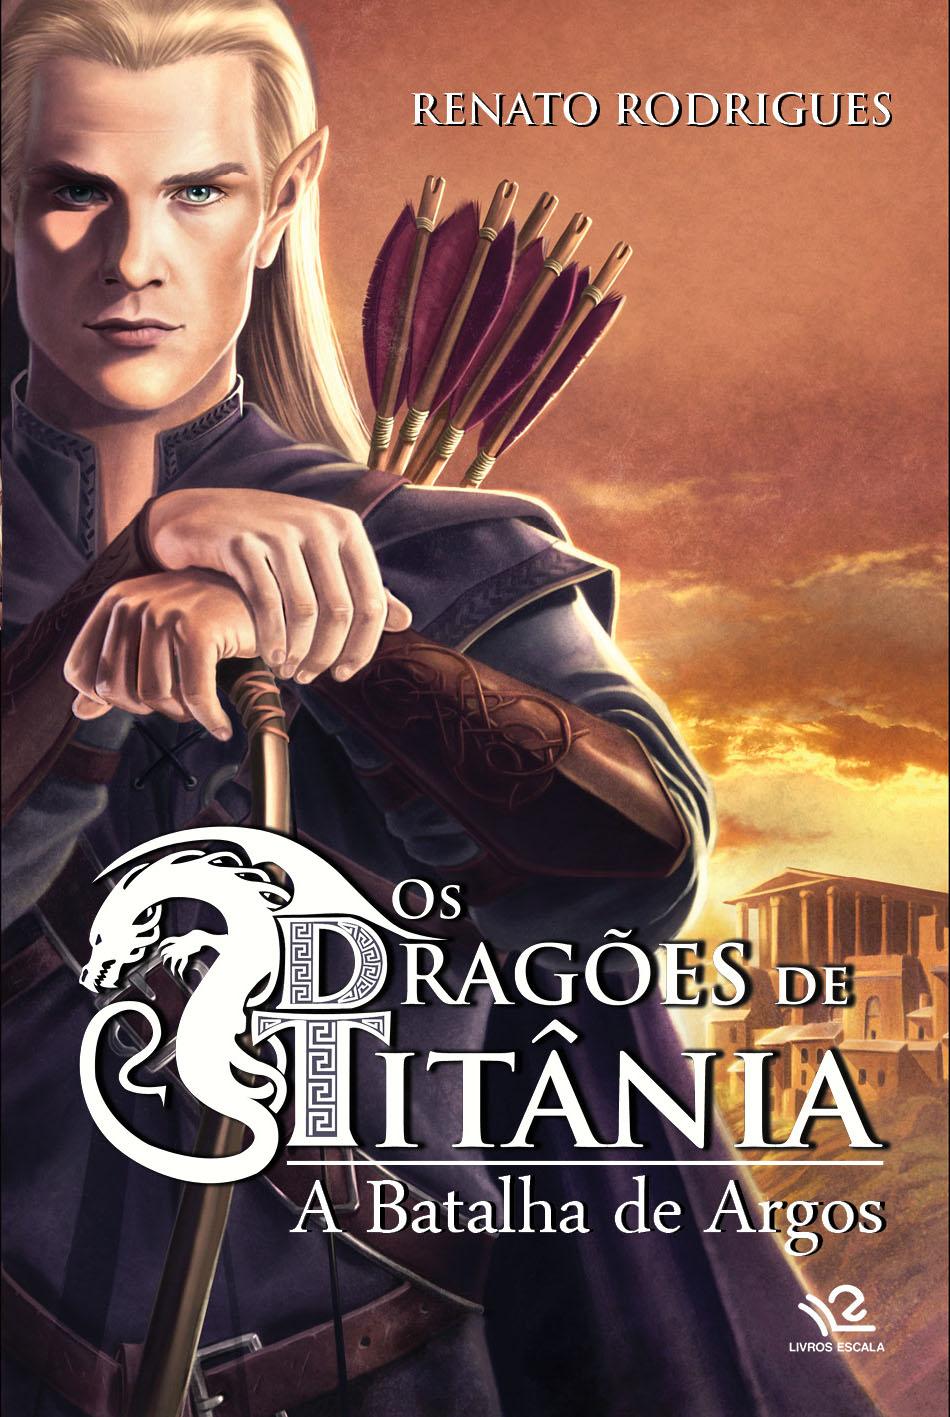 Dragões Para Sempre Delightful os dragões de titânia: maio 2011